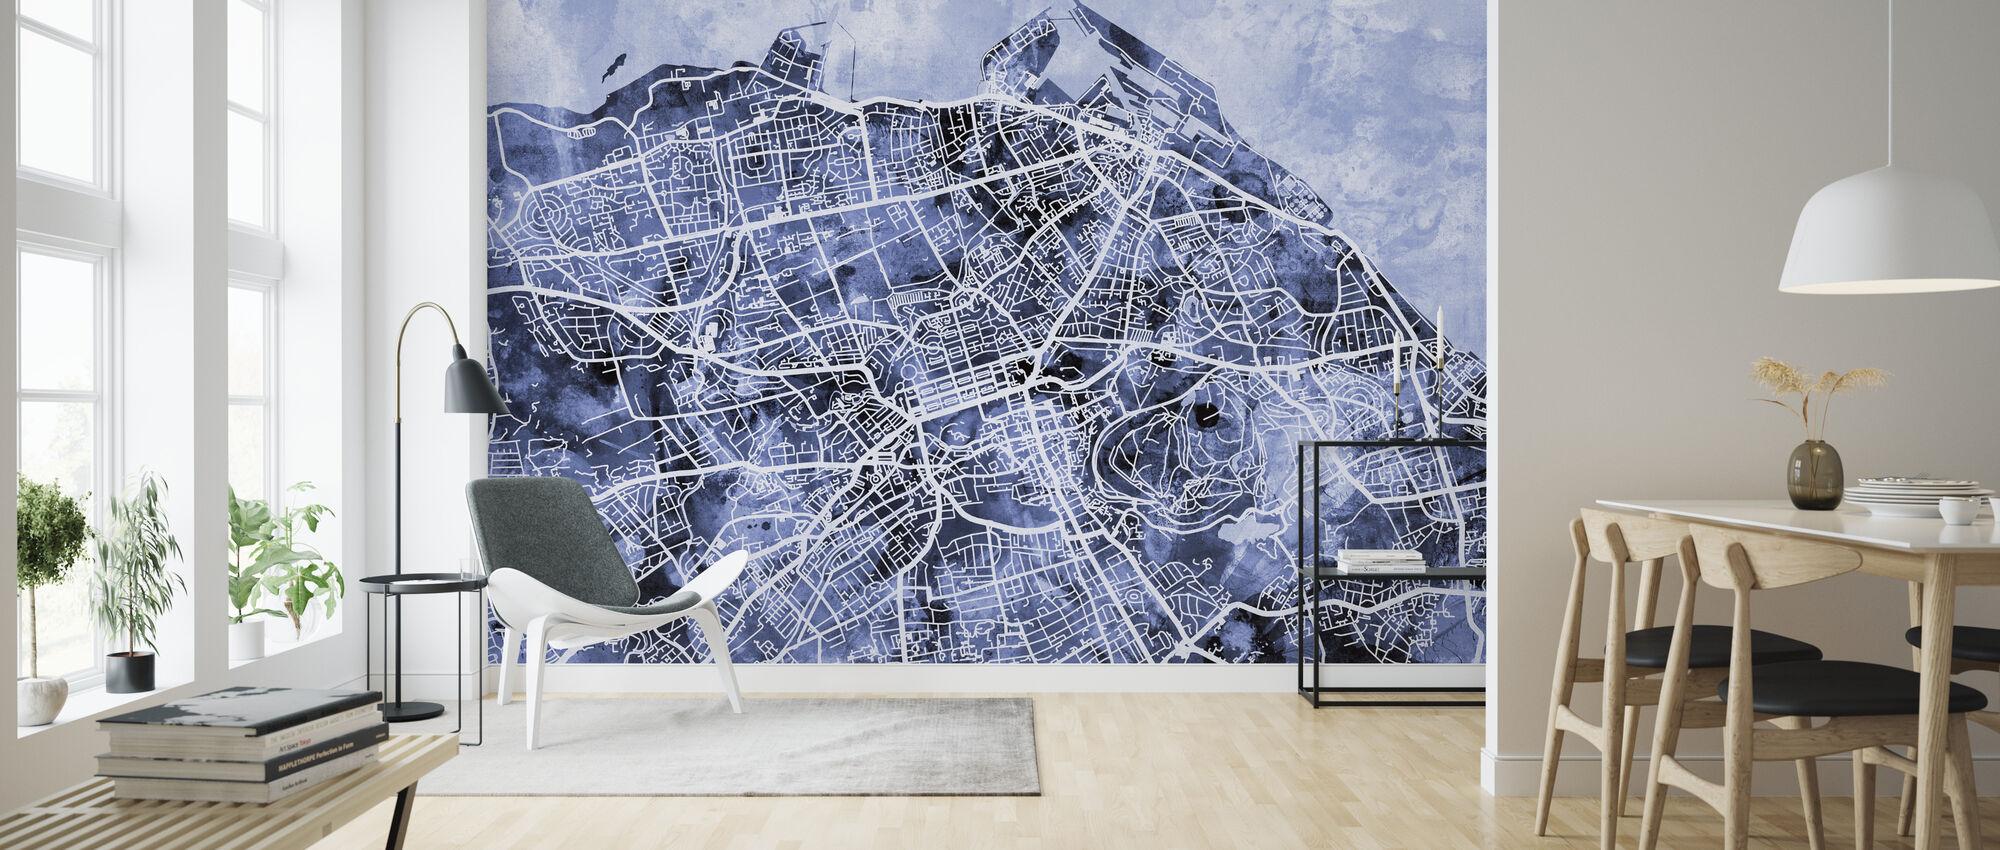 Edinburgh Street Map - Wallpaper - Living Room